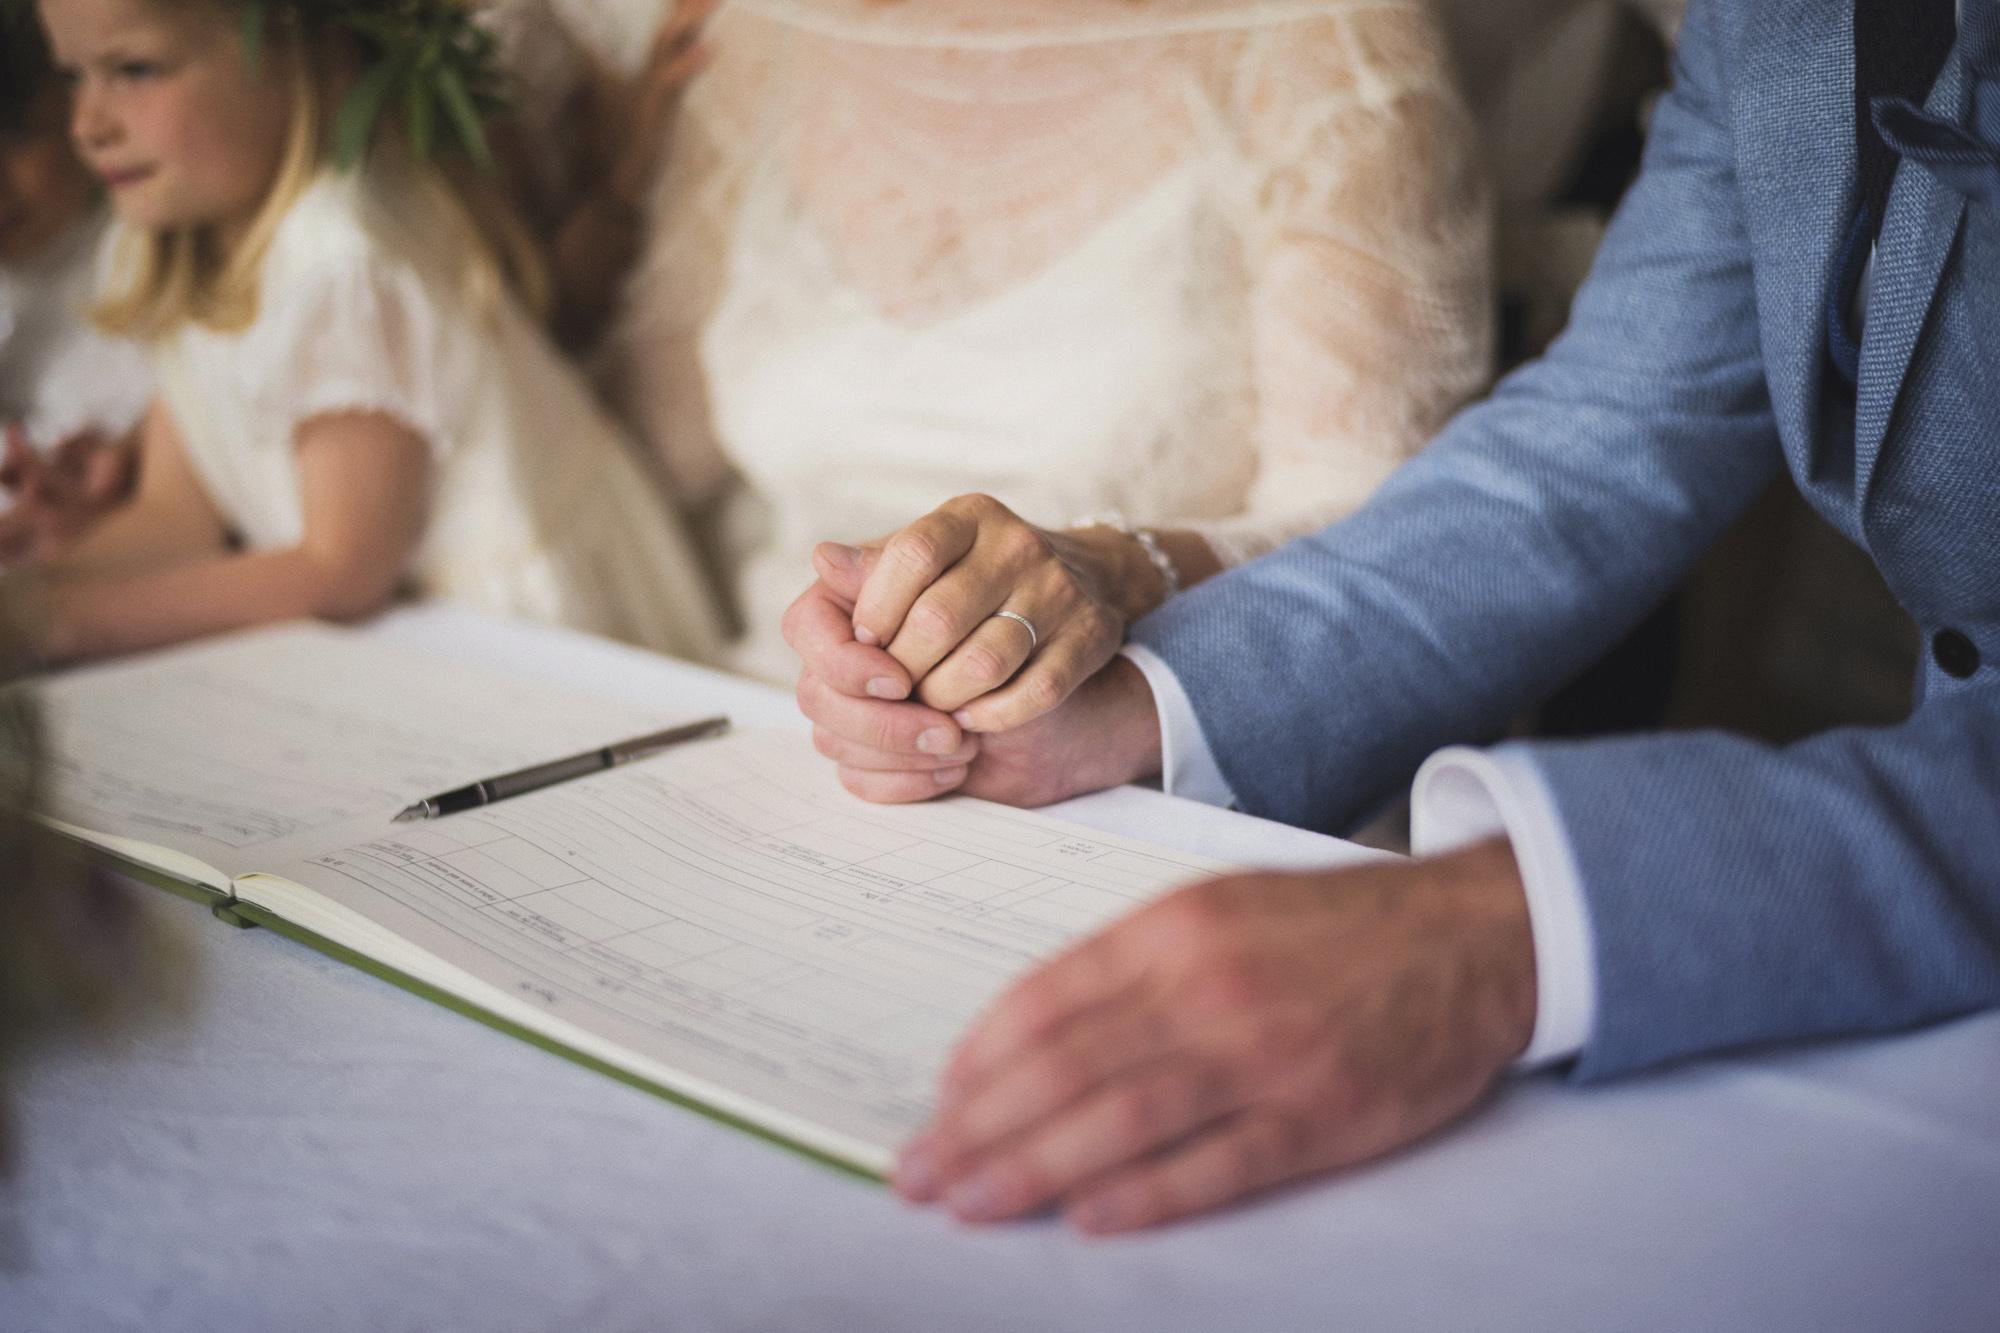 Jaz-Kate-Beaumont-Oyster-Silk-Bias-Cut-Wedding-Gown-Larkspur-Lace-Top-Sussex-Wedding-9.jpg